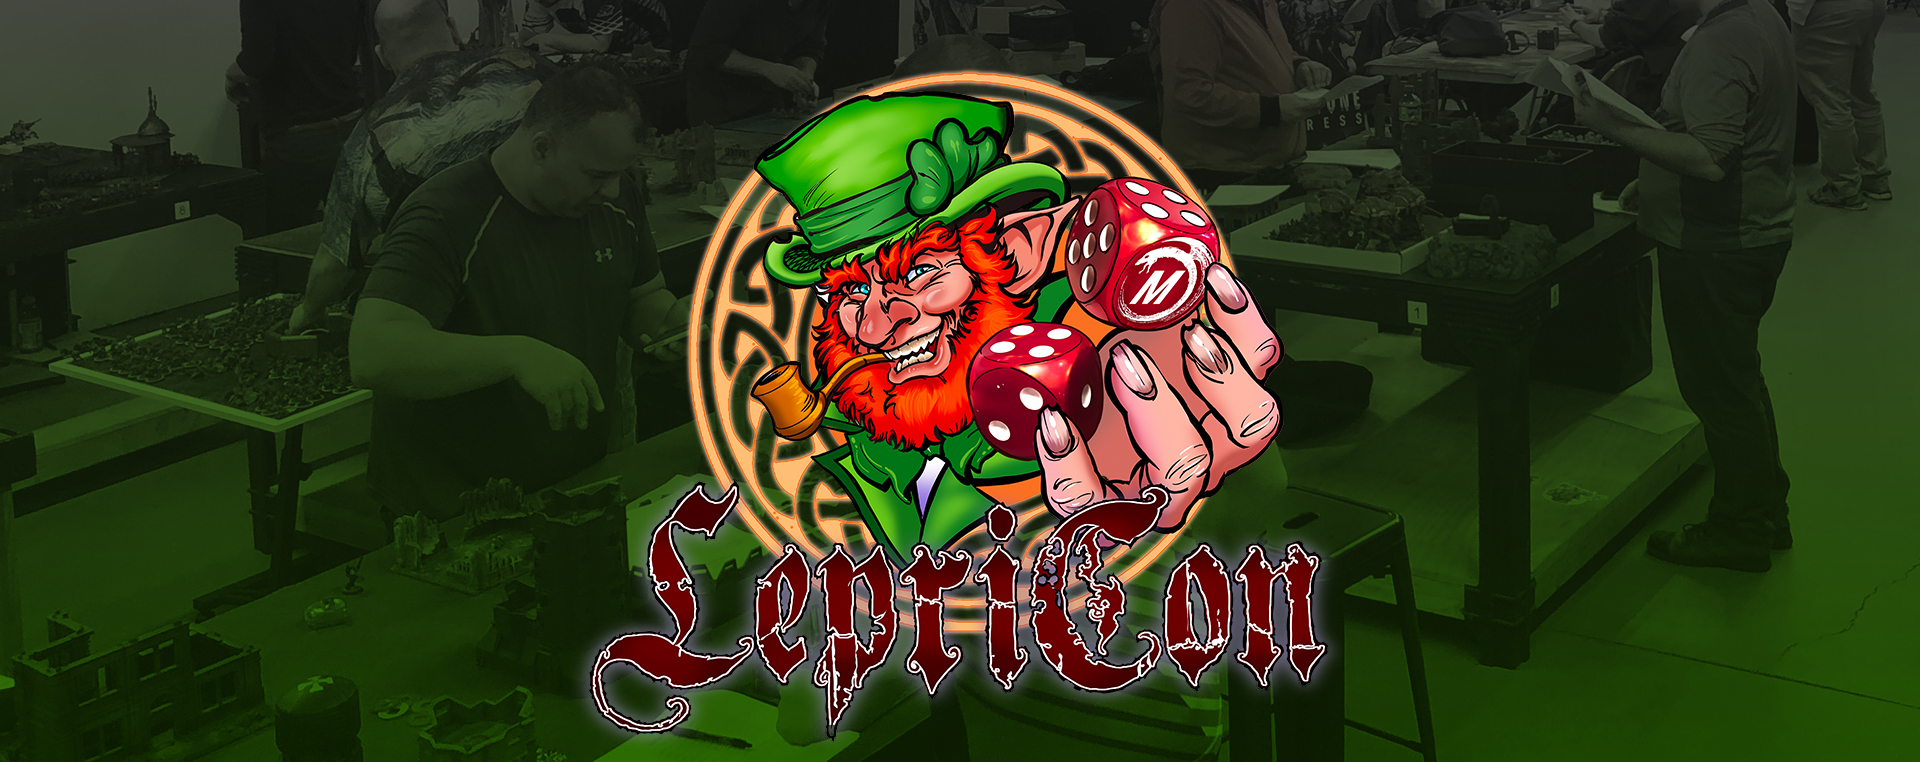 Lepricon-HOL-Banner.jpg